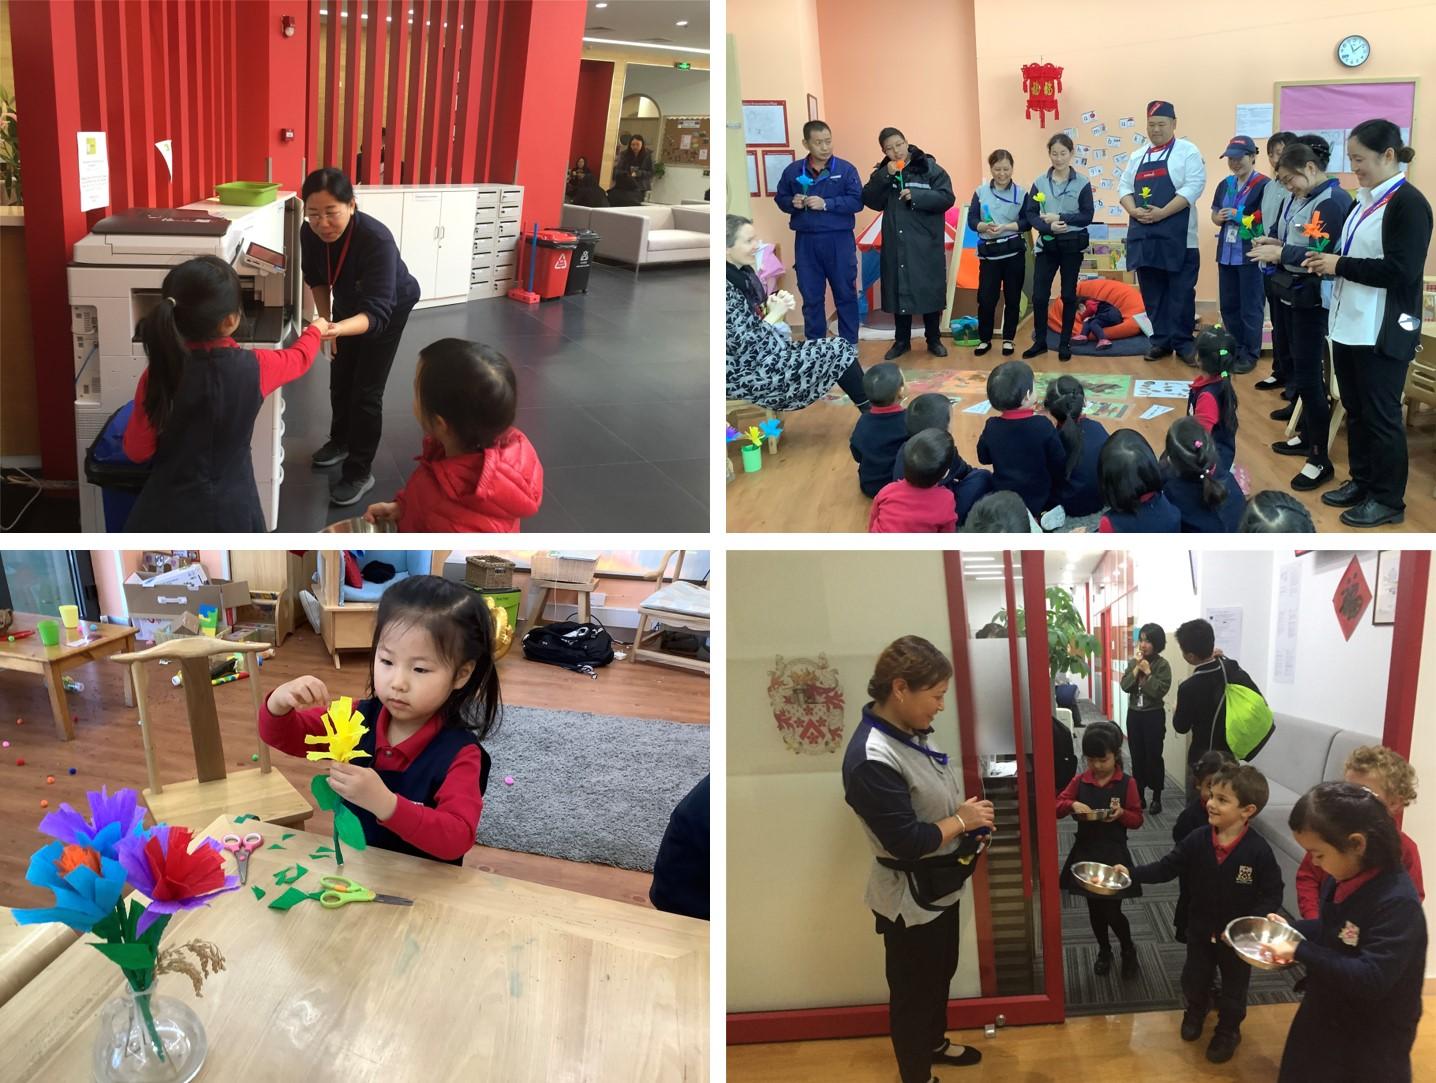 kindness-gestures-at-dcb-北京德威英国国际学校